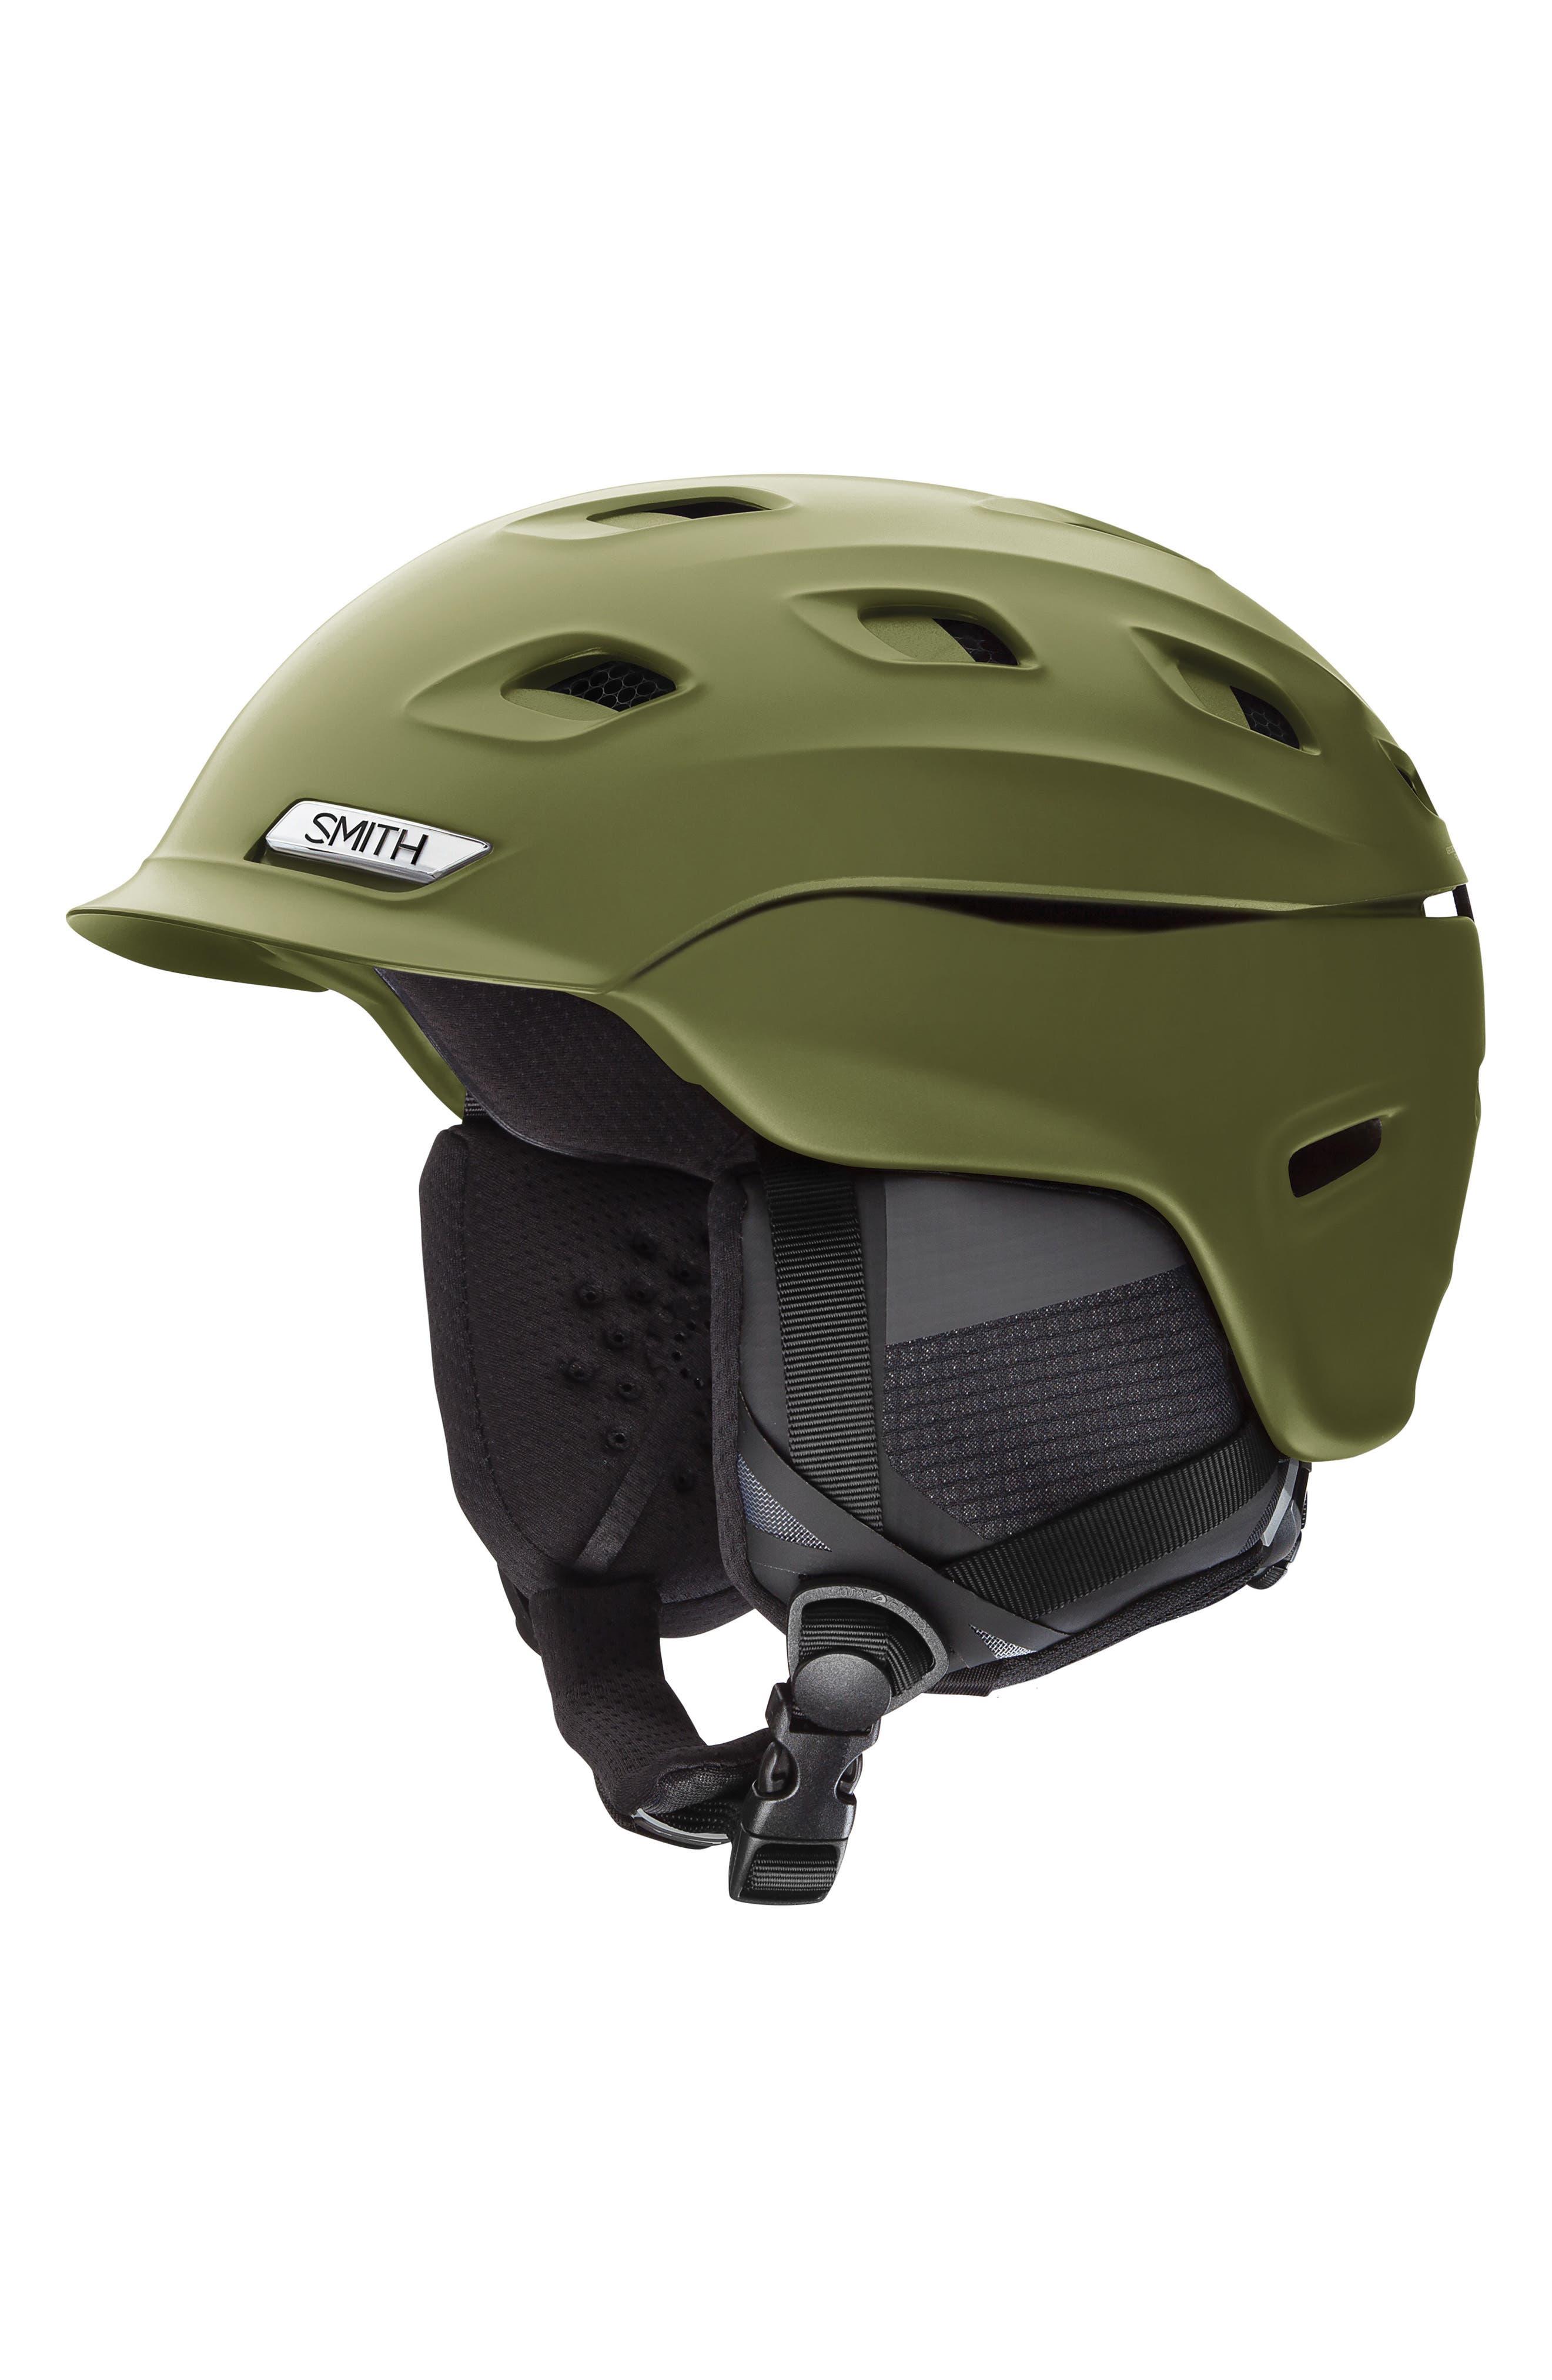 Main Image - Smith Vantage MIPS Ski Helmet